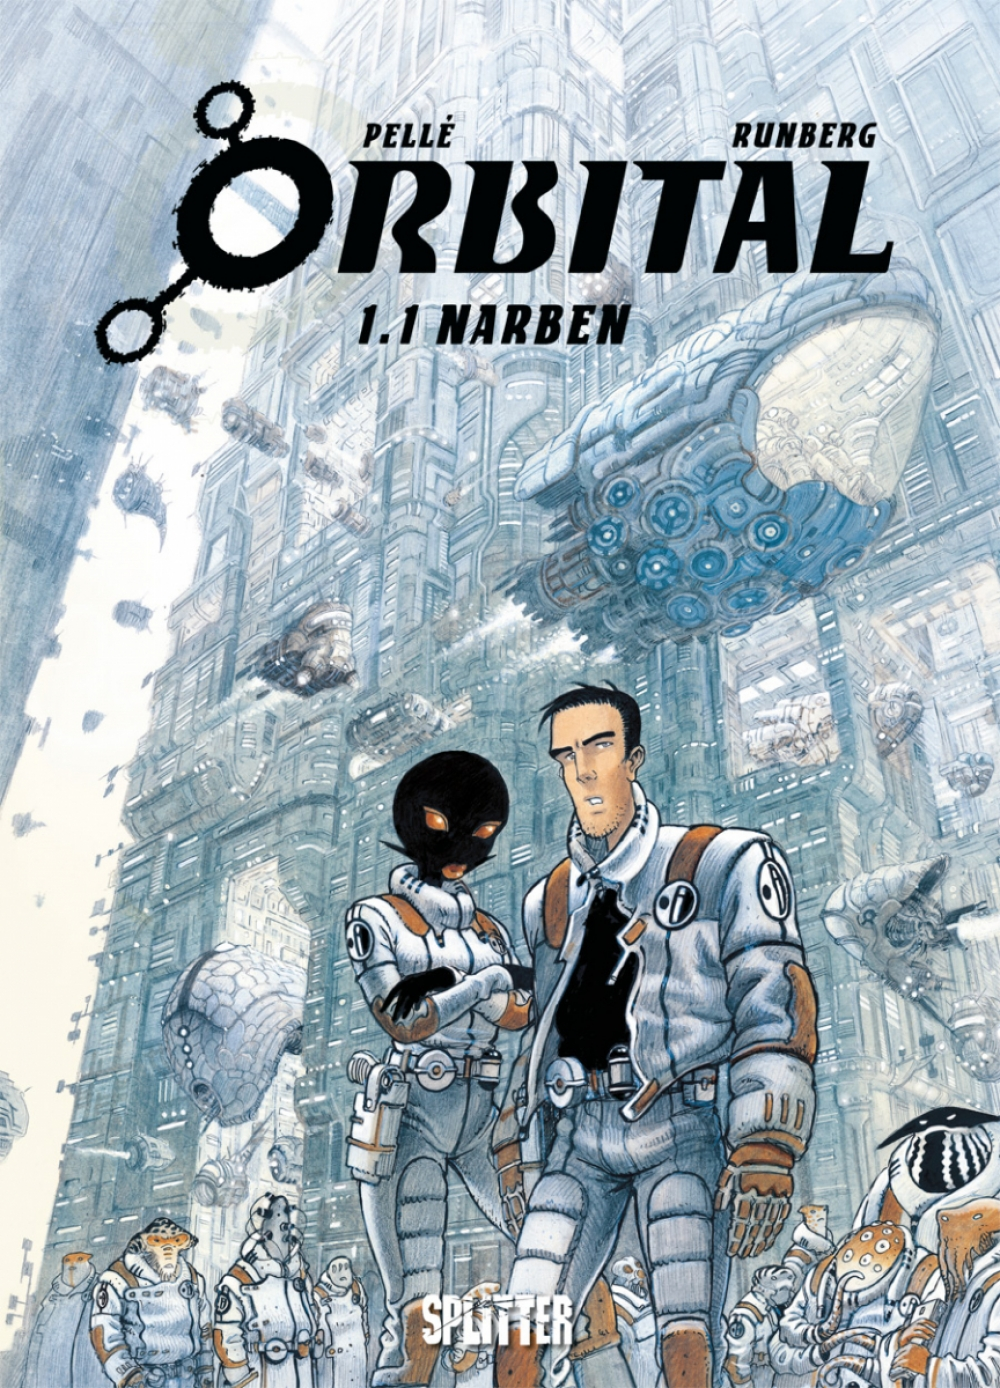 Orbital 1.1 : Narben